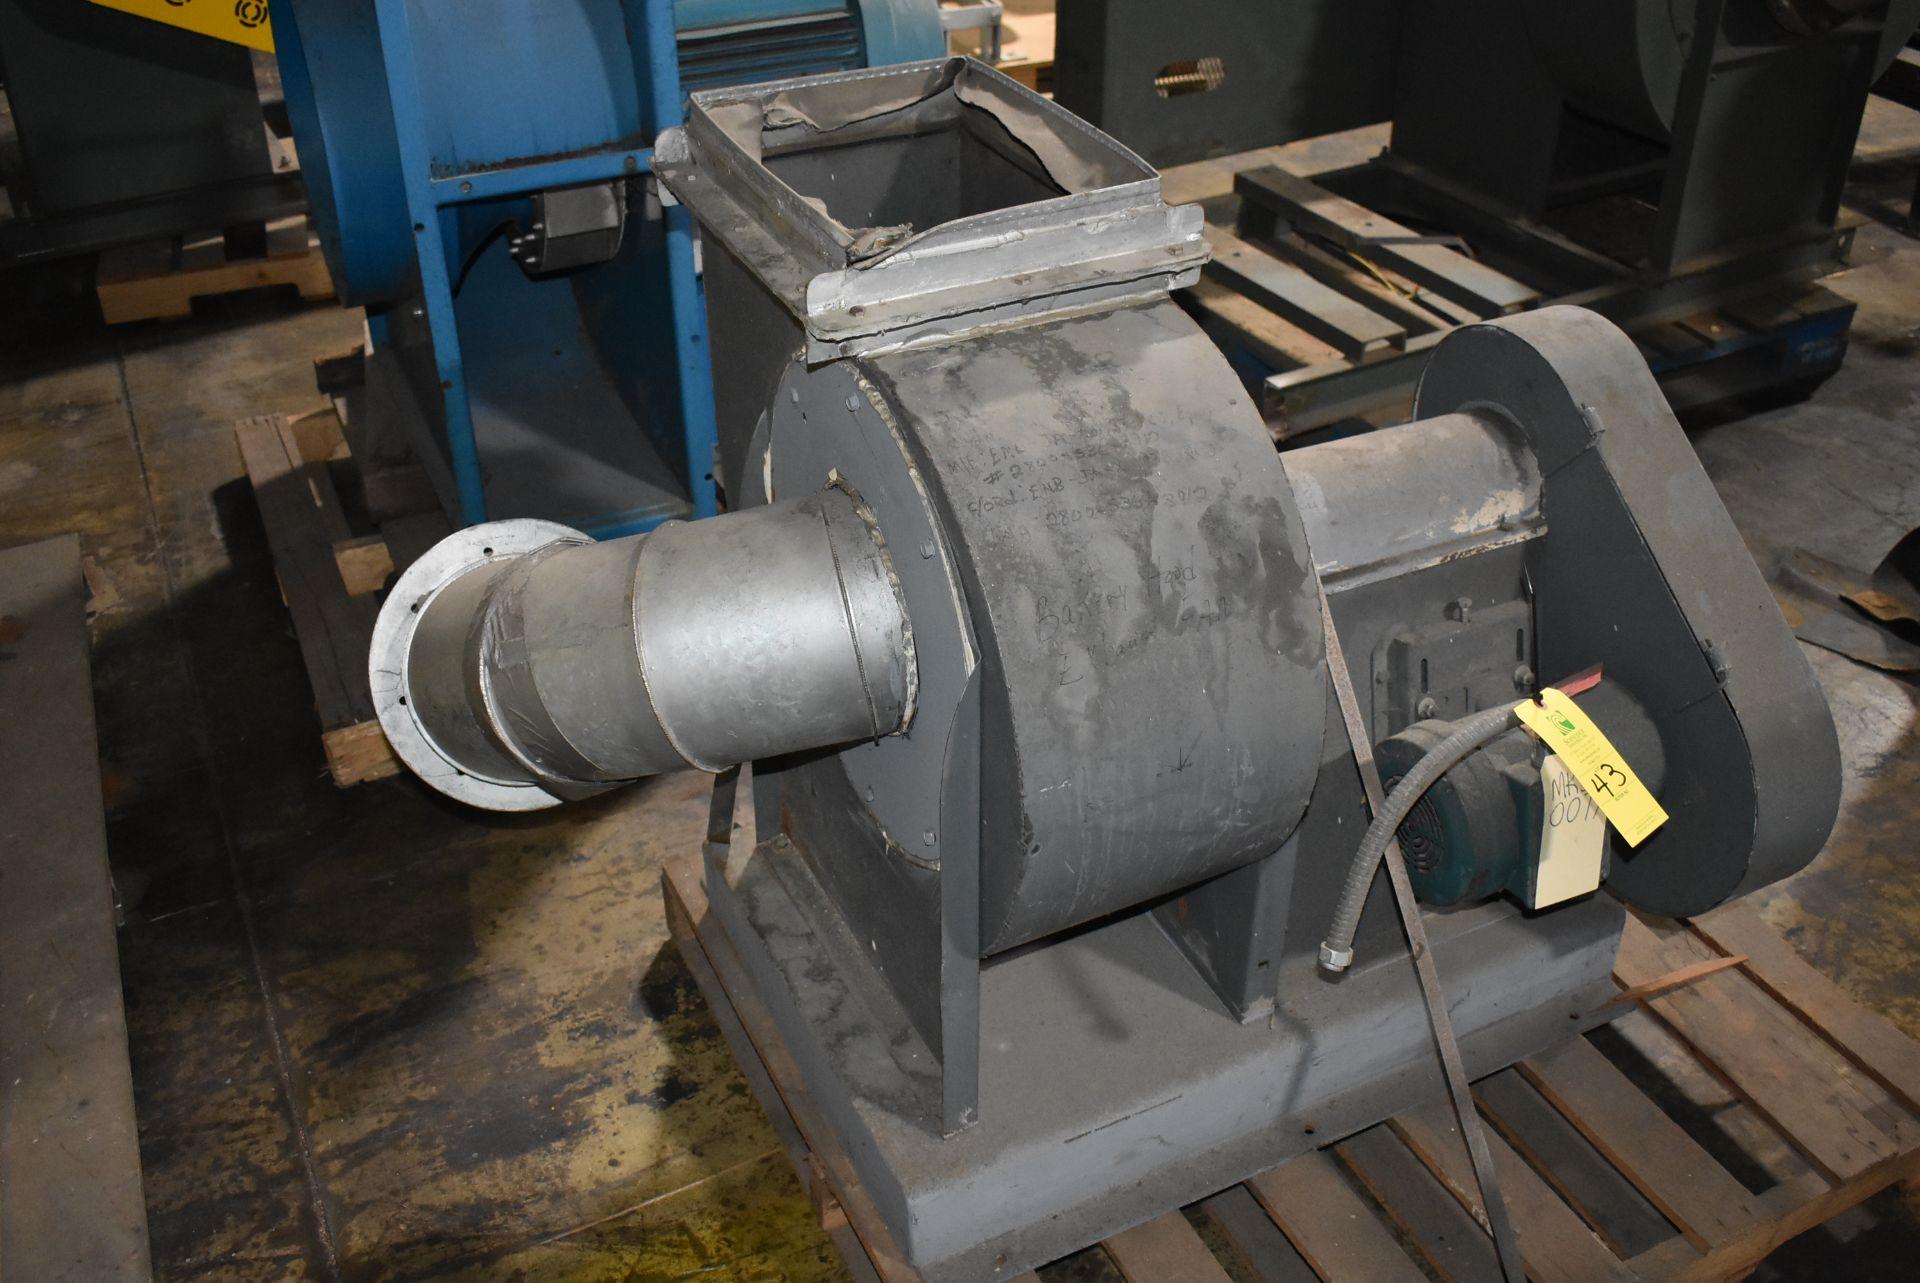 Porter/Peerless Model #150 Blower, Rated 2180 CFM w/2 HP Motor - Image 3 of 3